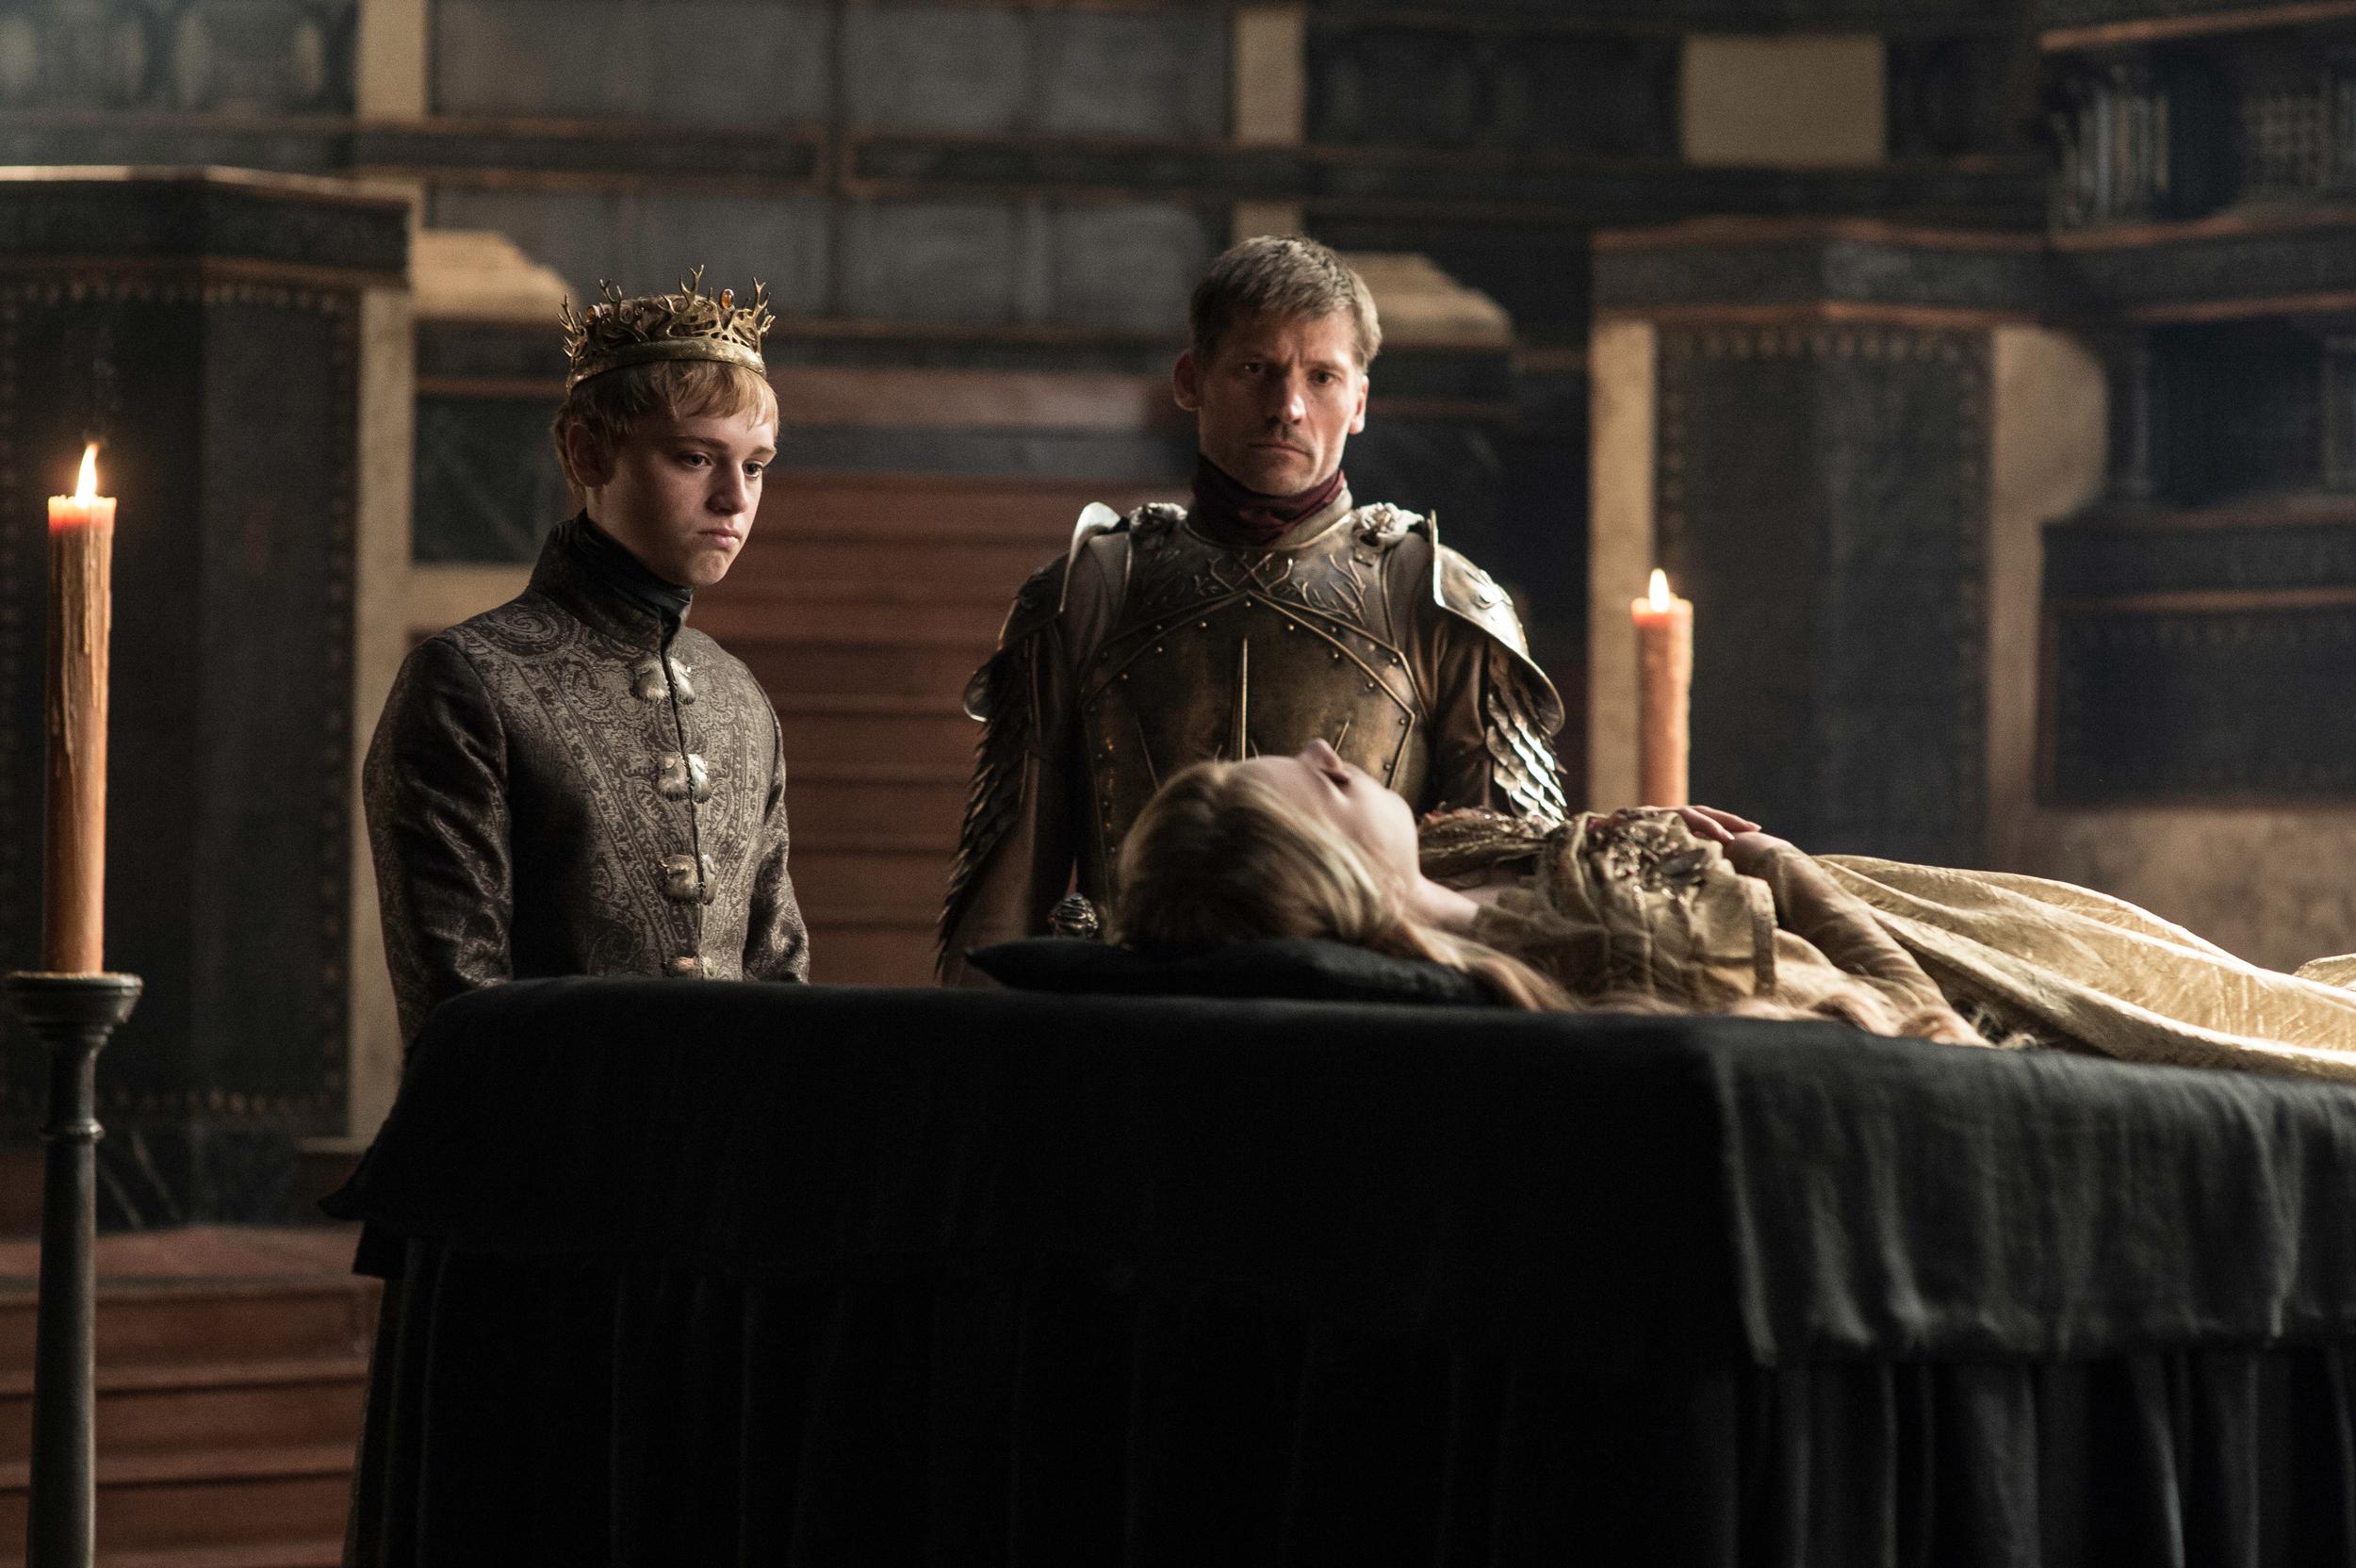 Dean-Charles Chapman as Tommen Baratheon and Nikolaj Coster-Waldau as Jaime Lannister